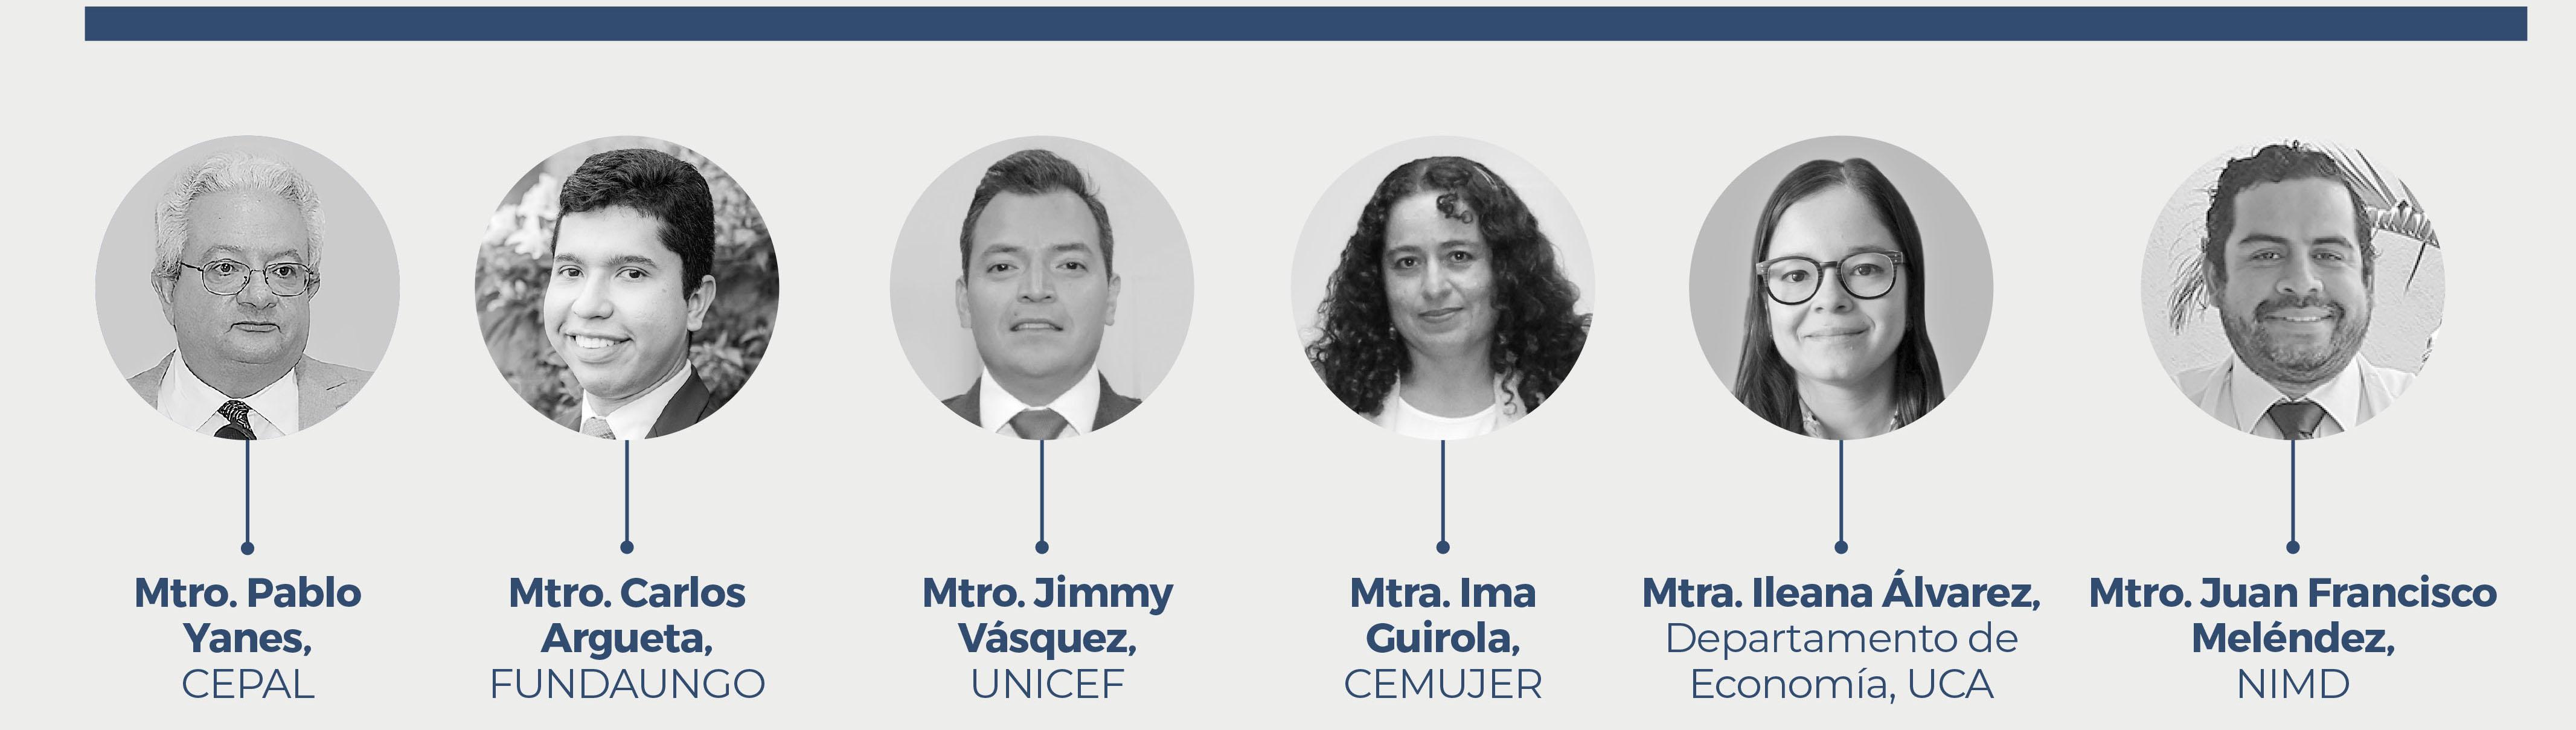 Panelistas_17_de_abril.jpg